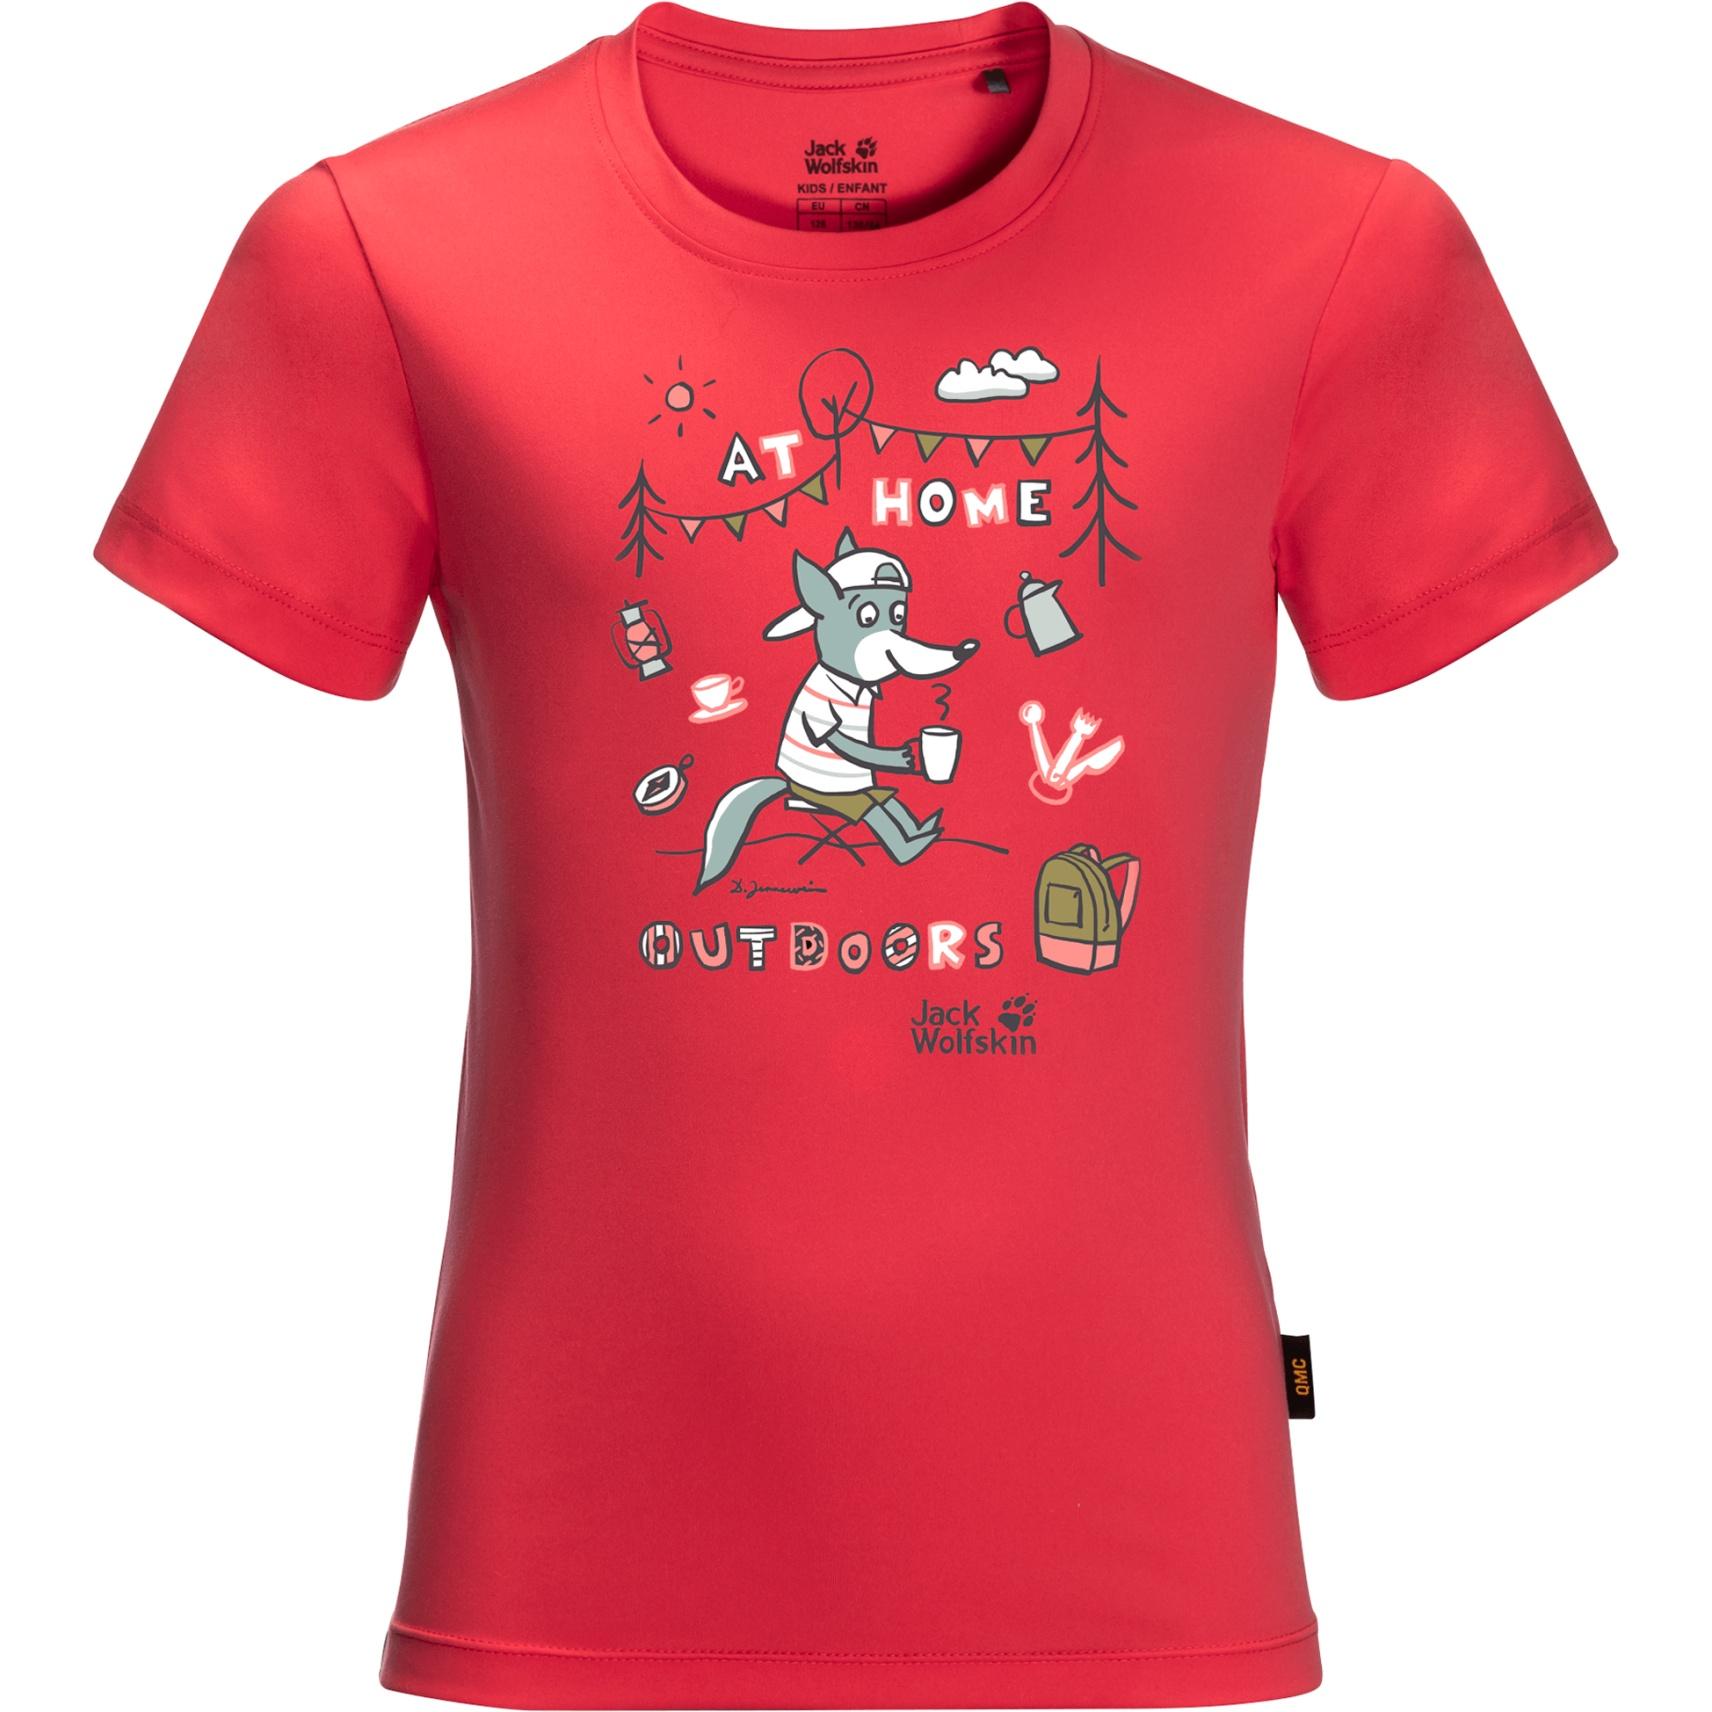 Jack Wolfskin Happy Camper Kinder T-Shirt - tulip red